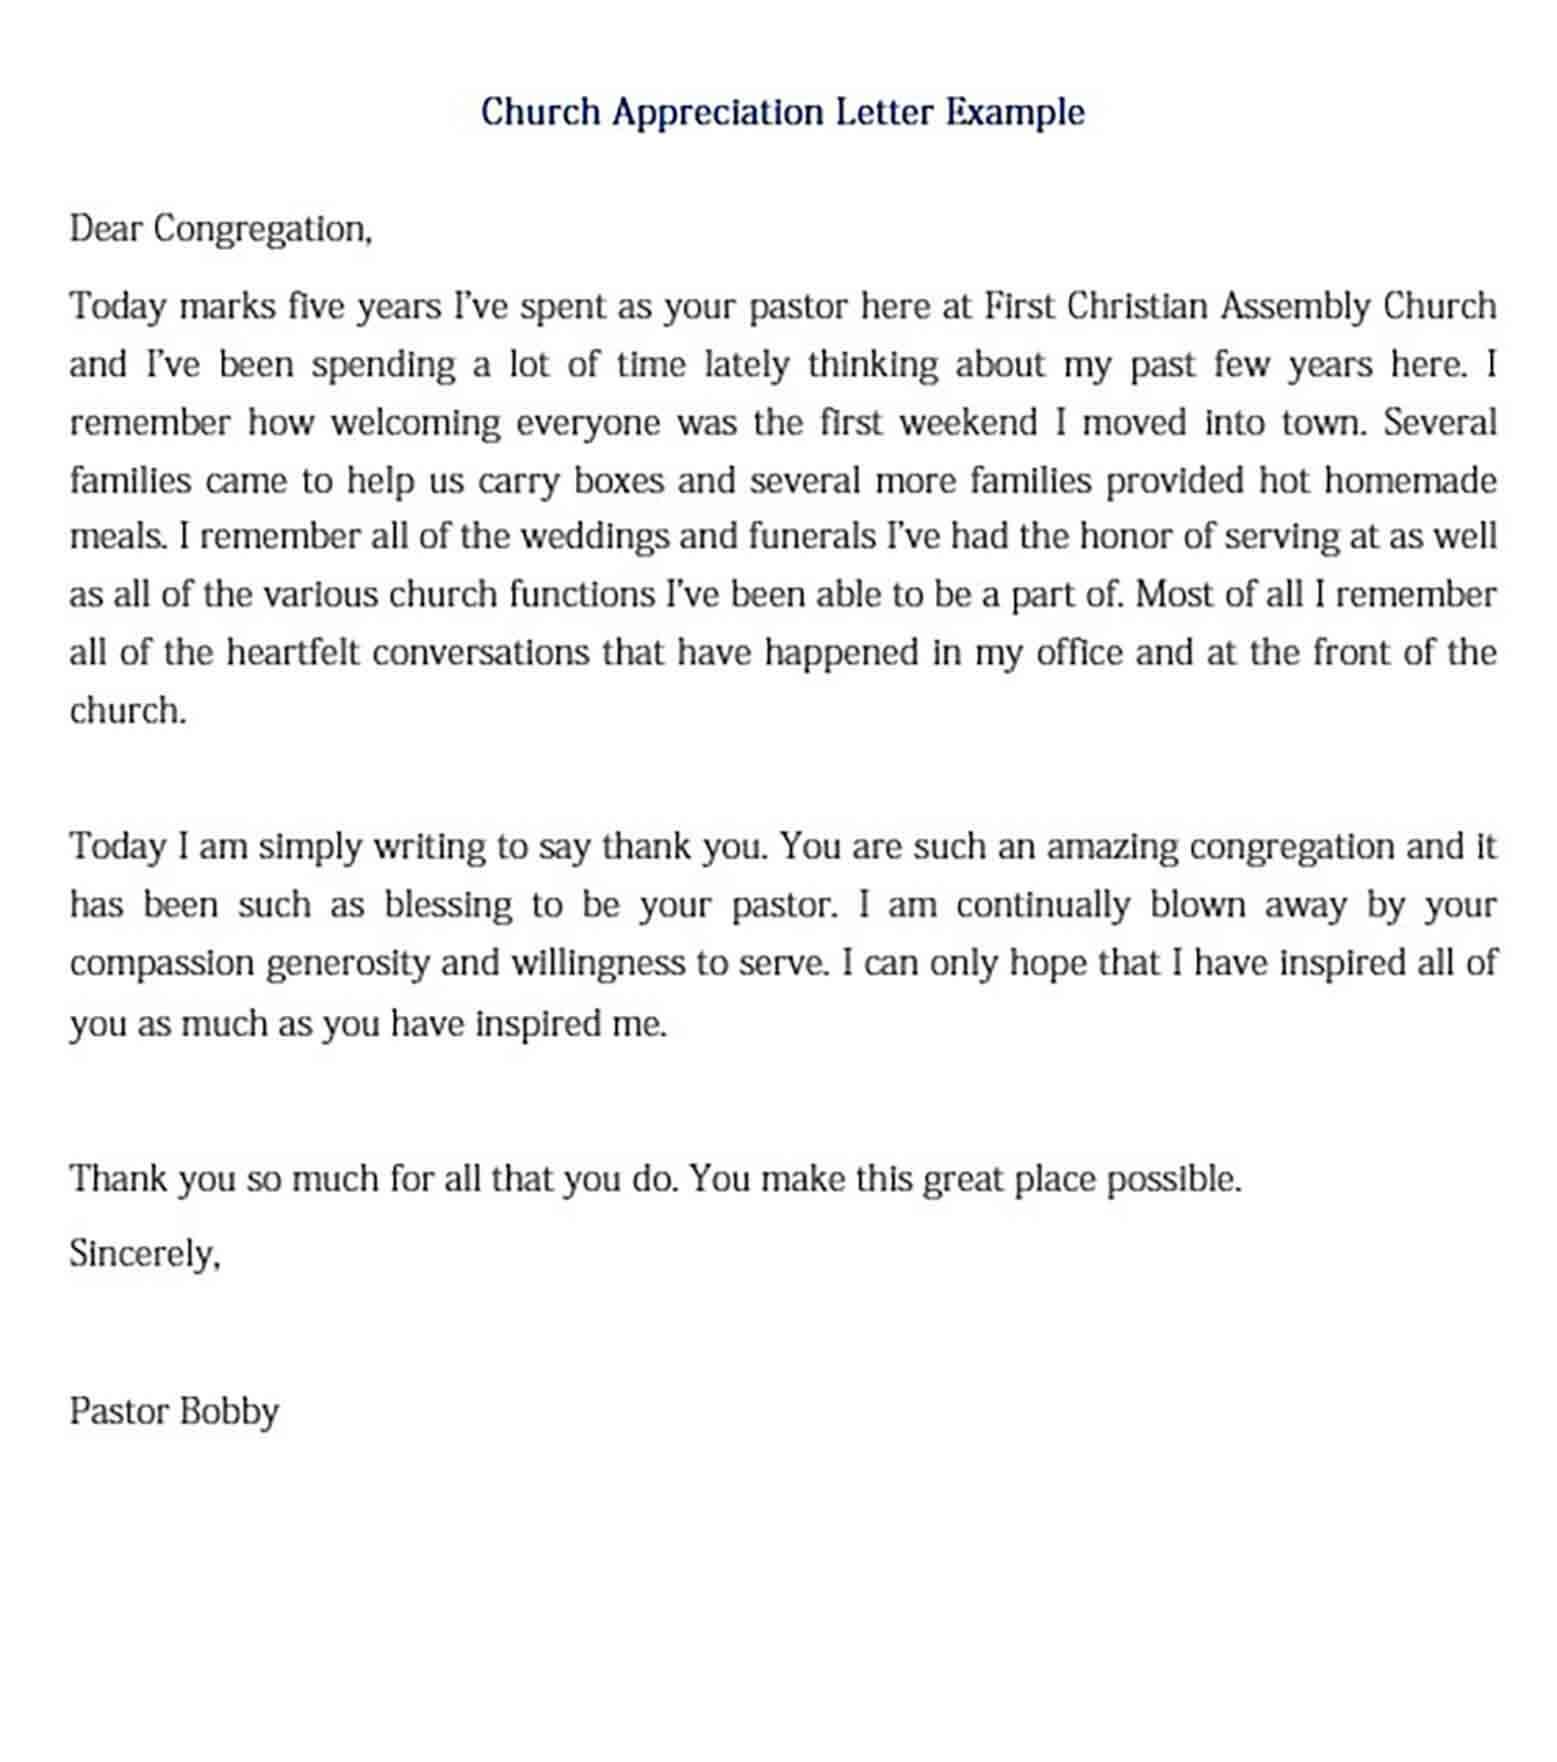 Church Appreciation Letter Example